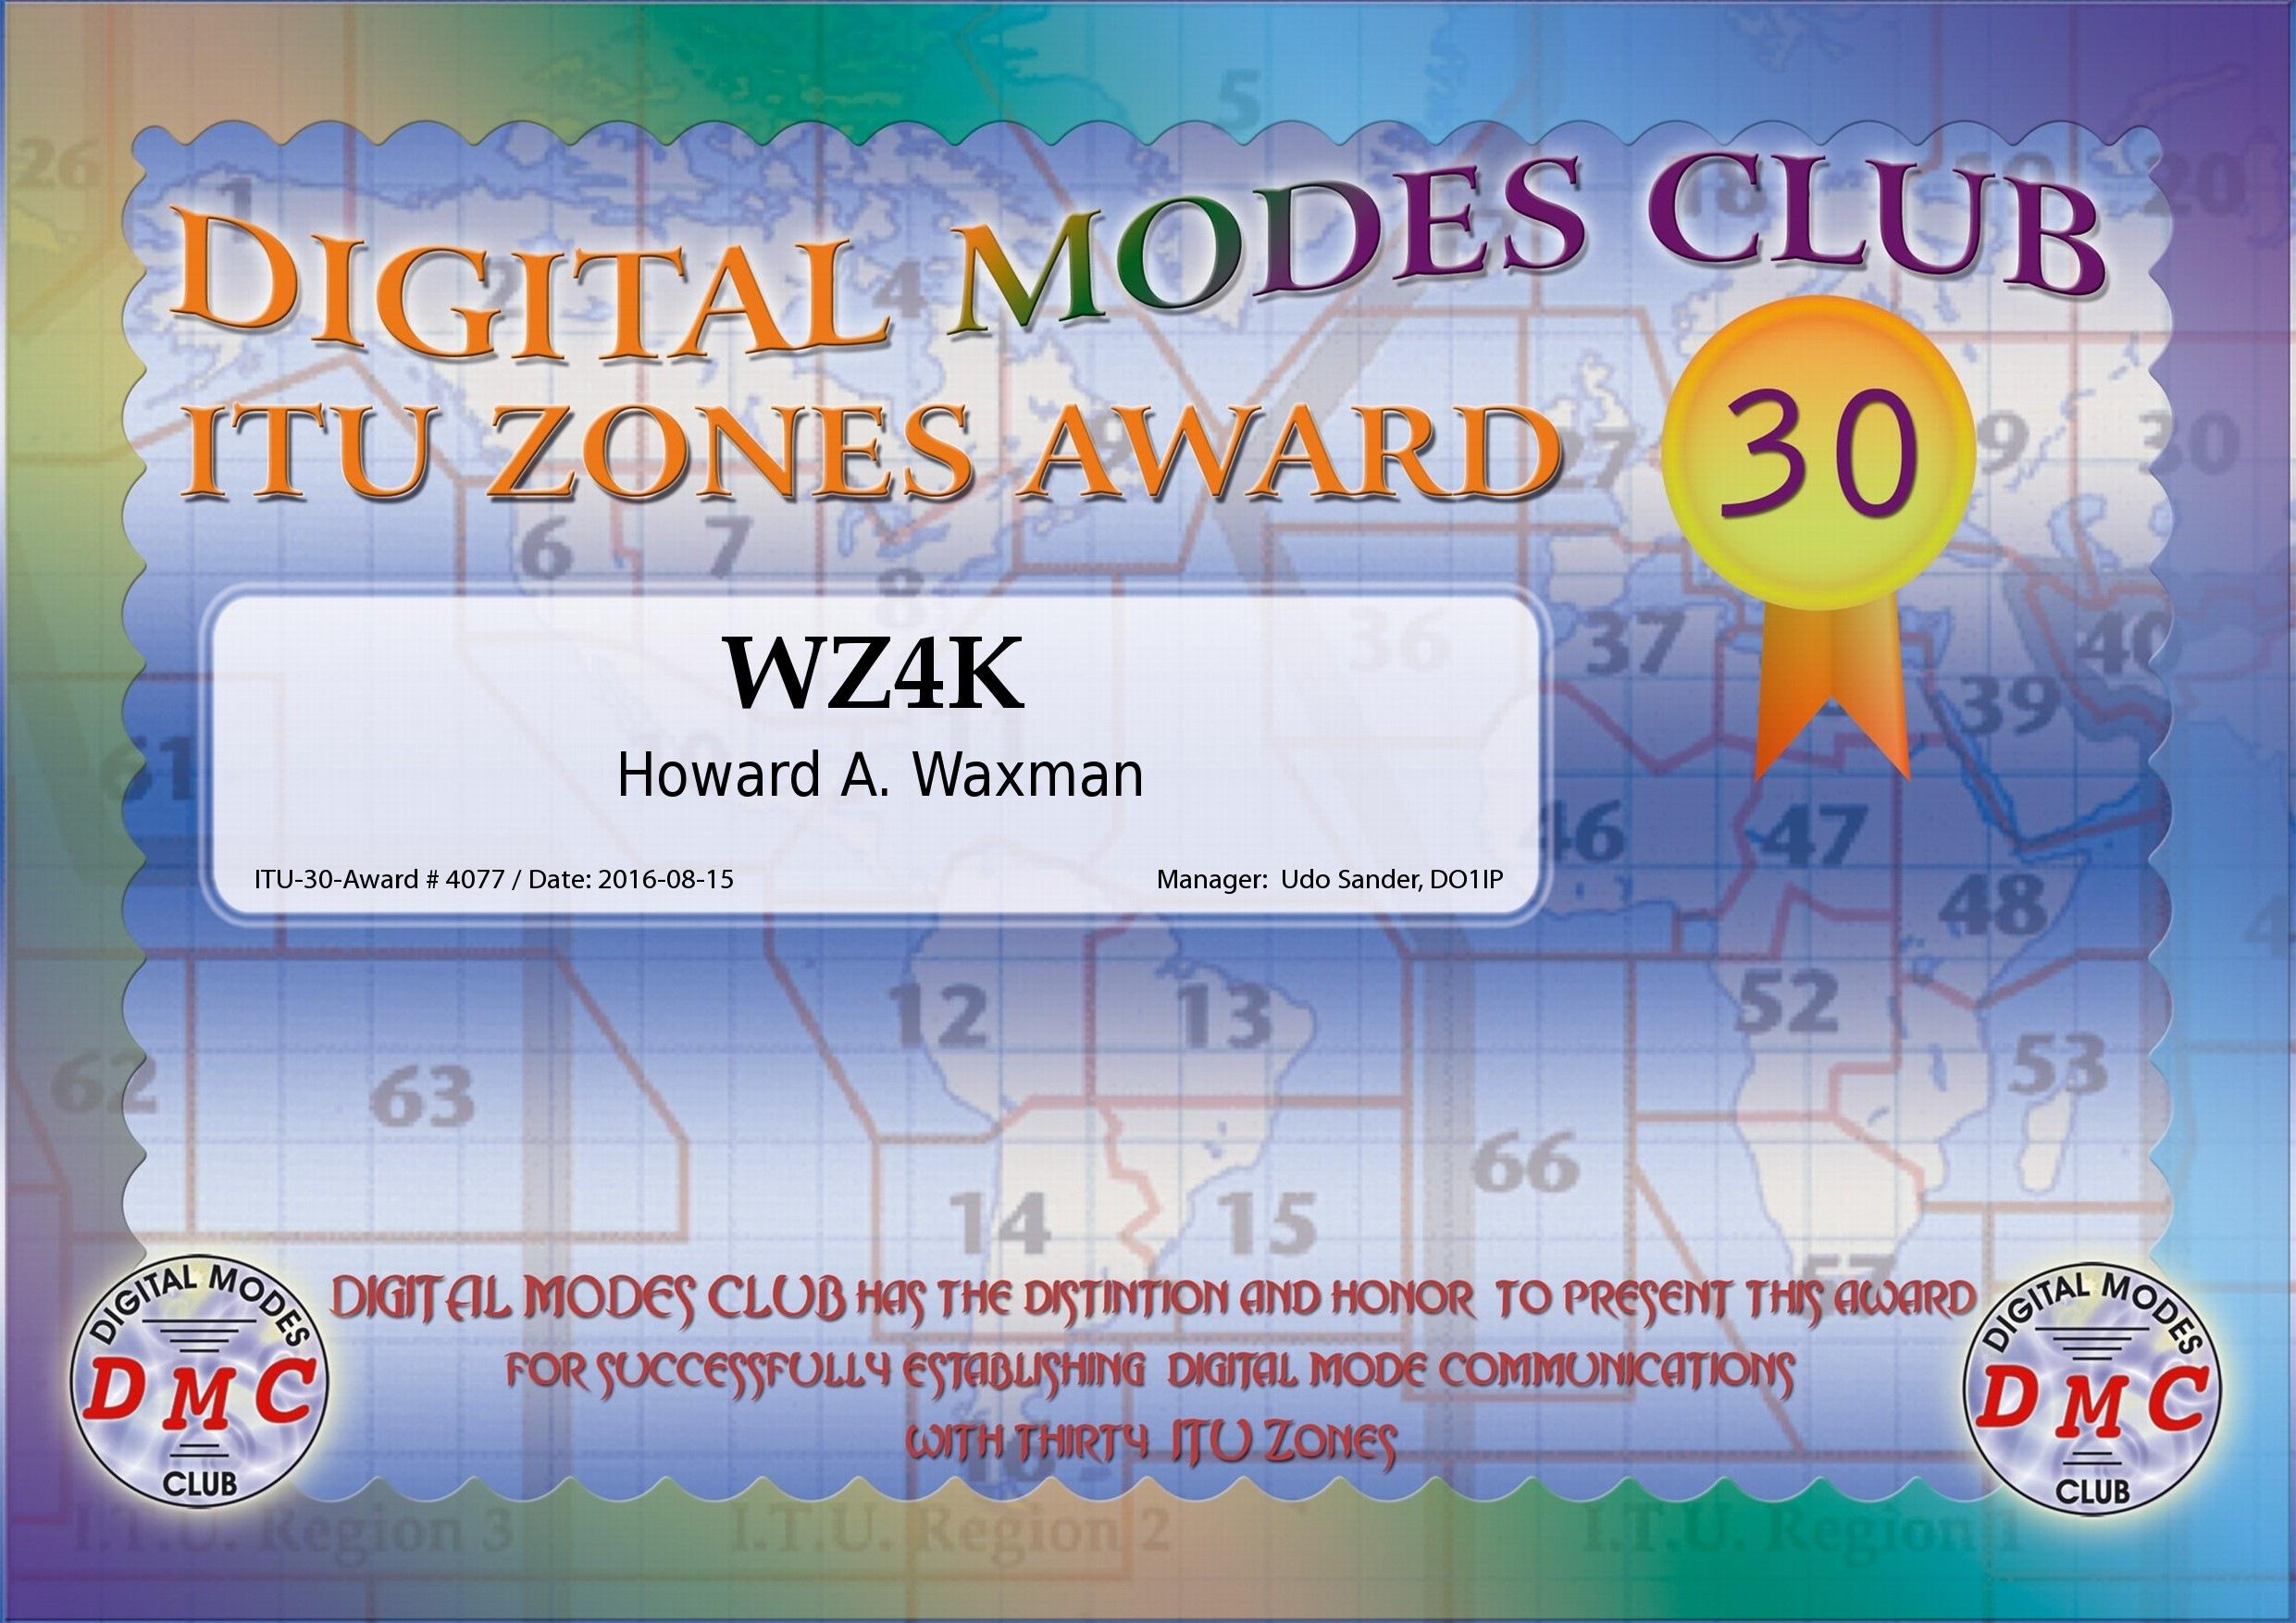 ITU-30-4077-WZ4K